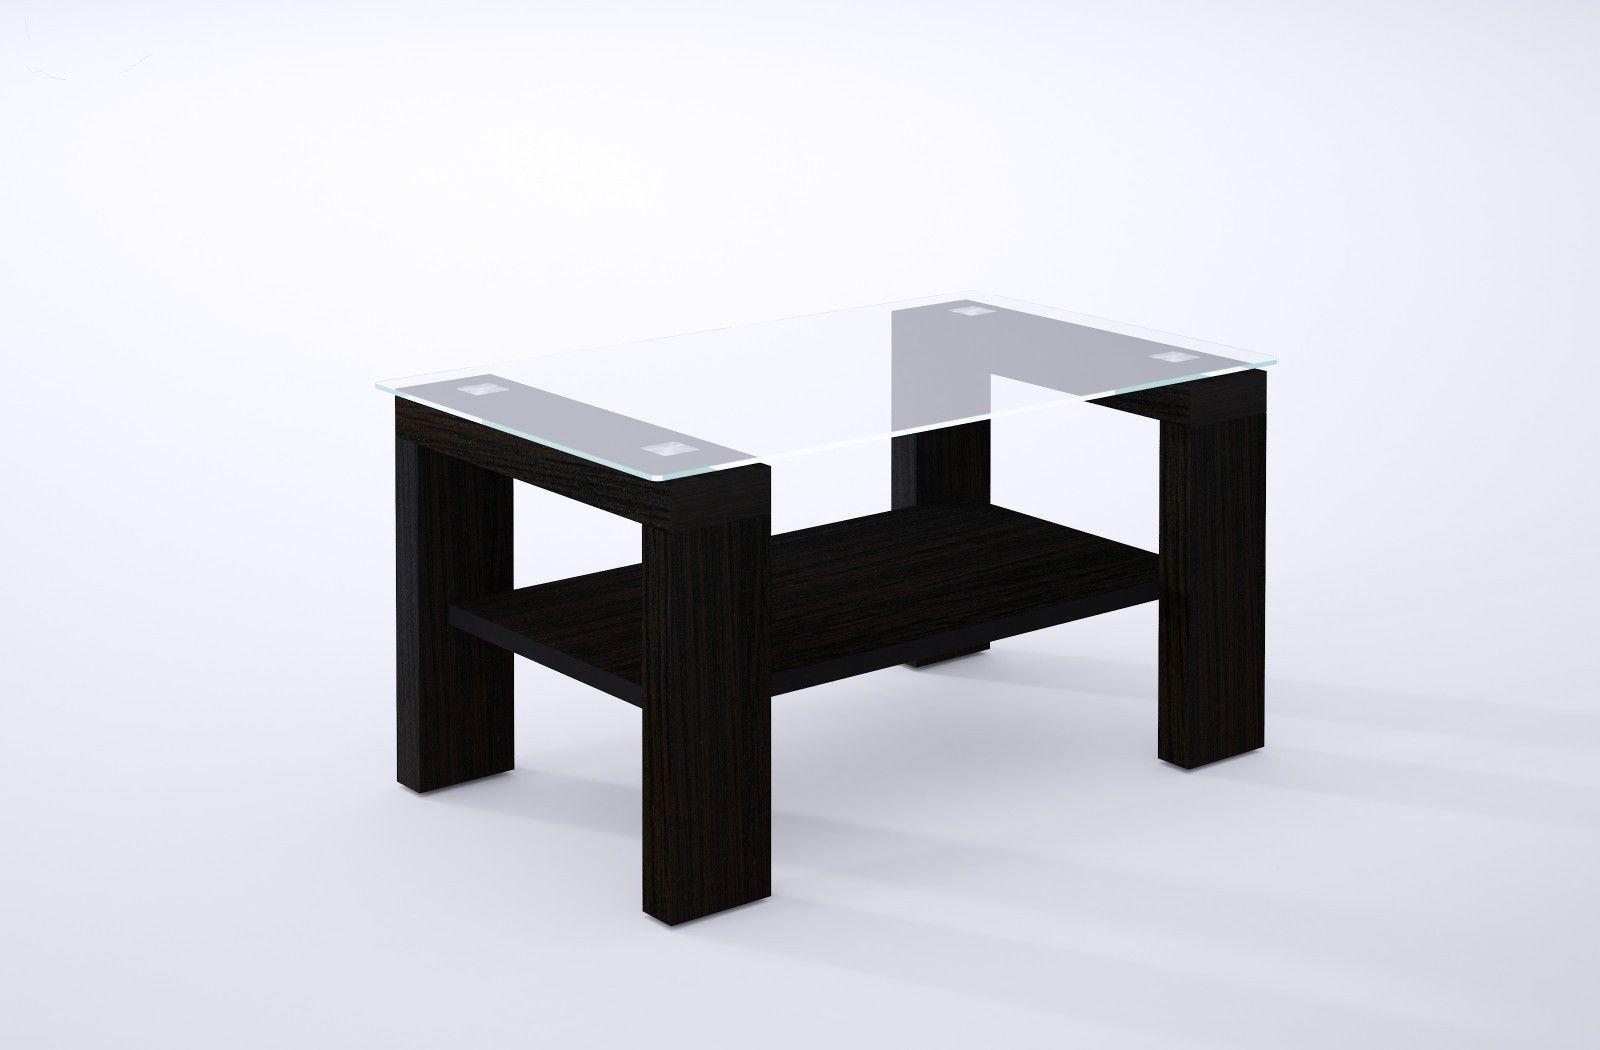 glastisch modern awesome esszimmer modern glastisch. Black Bedroom Furniture Sets. Home Design Ideas